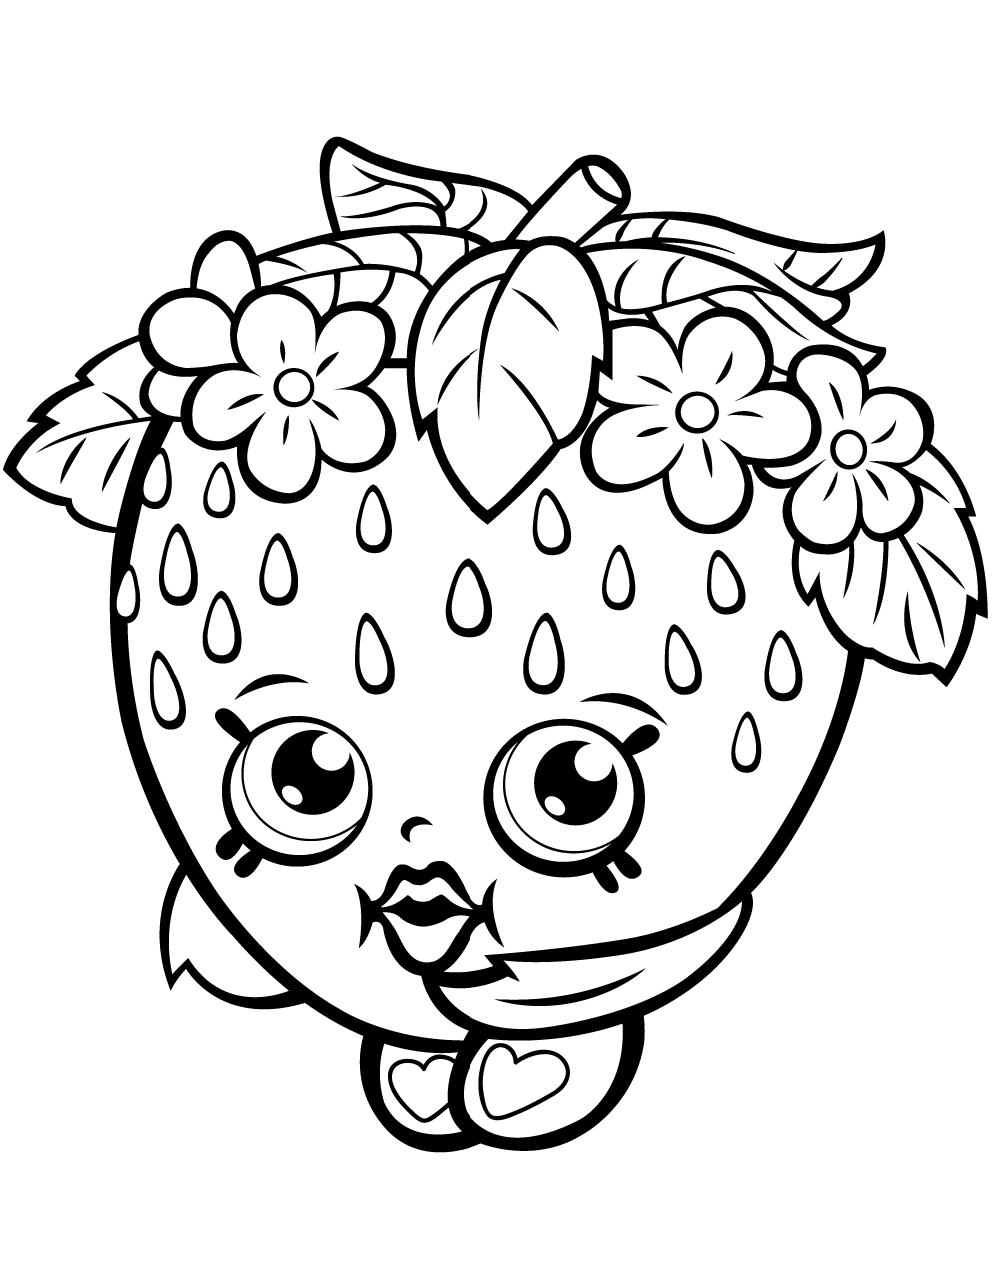 Kooky Cookie Shopkin Season 1 Coloring Games Coloring Games At